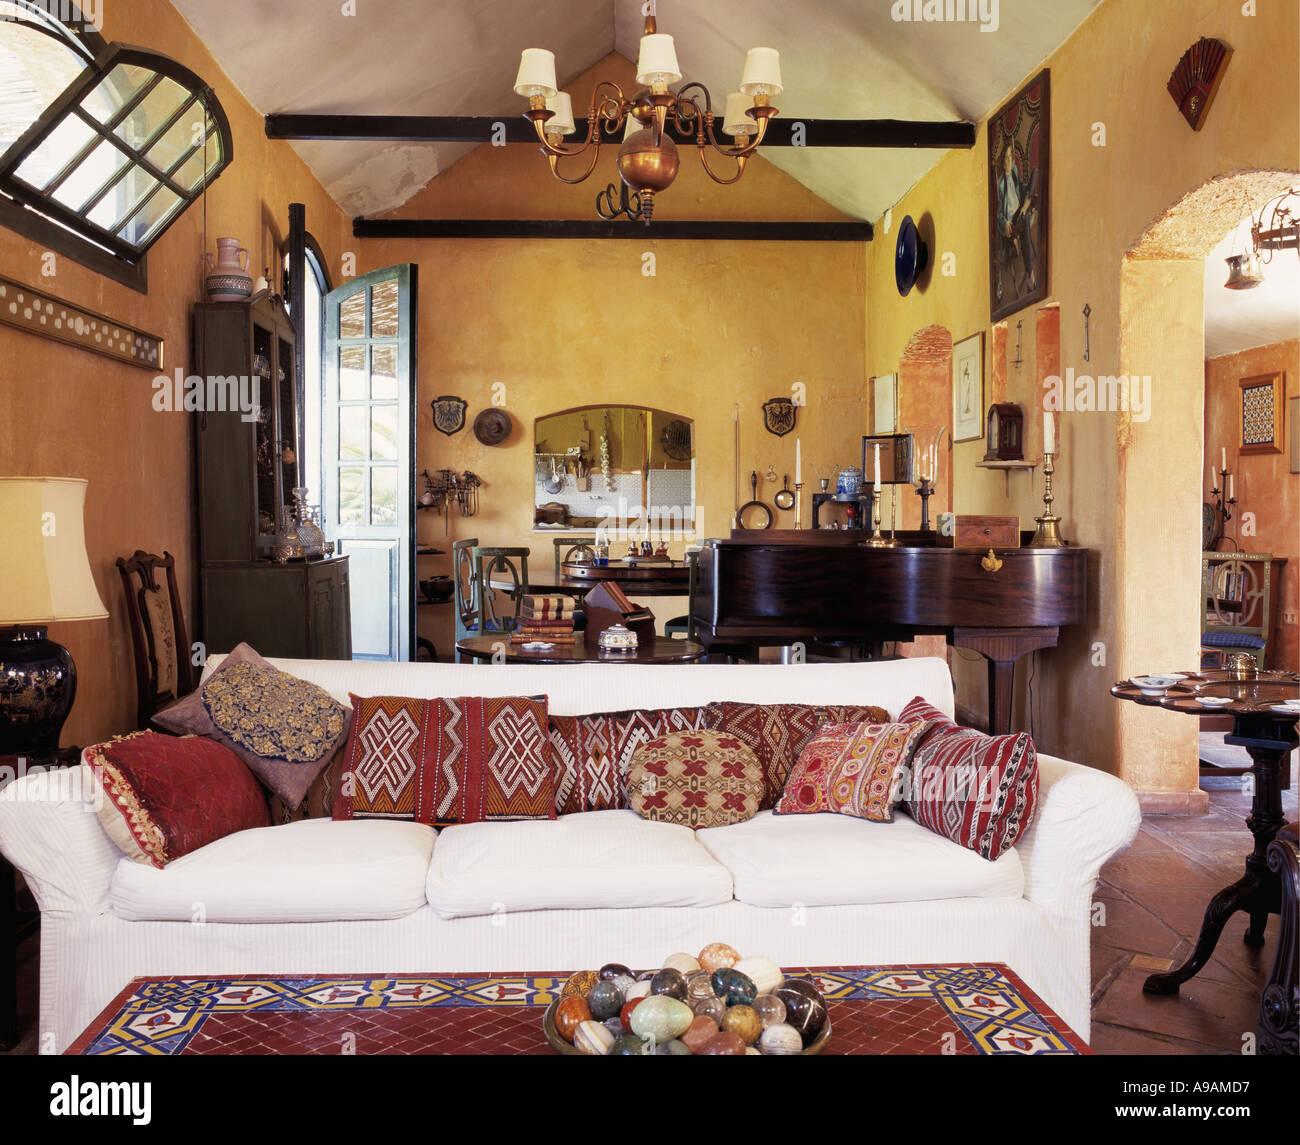 Kelim Cushions On White Sofa In Yellow Living Room In Spanish Villa